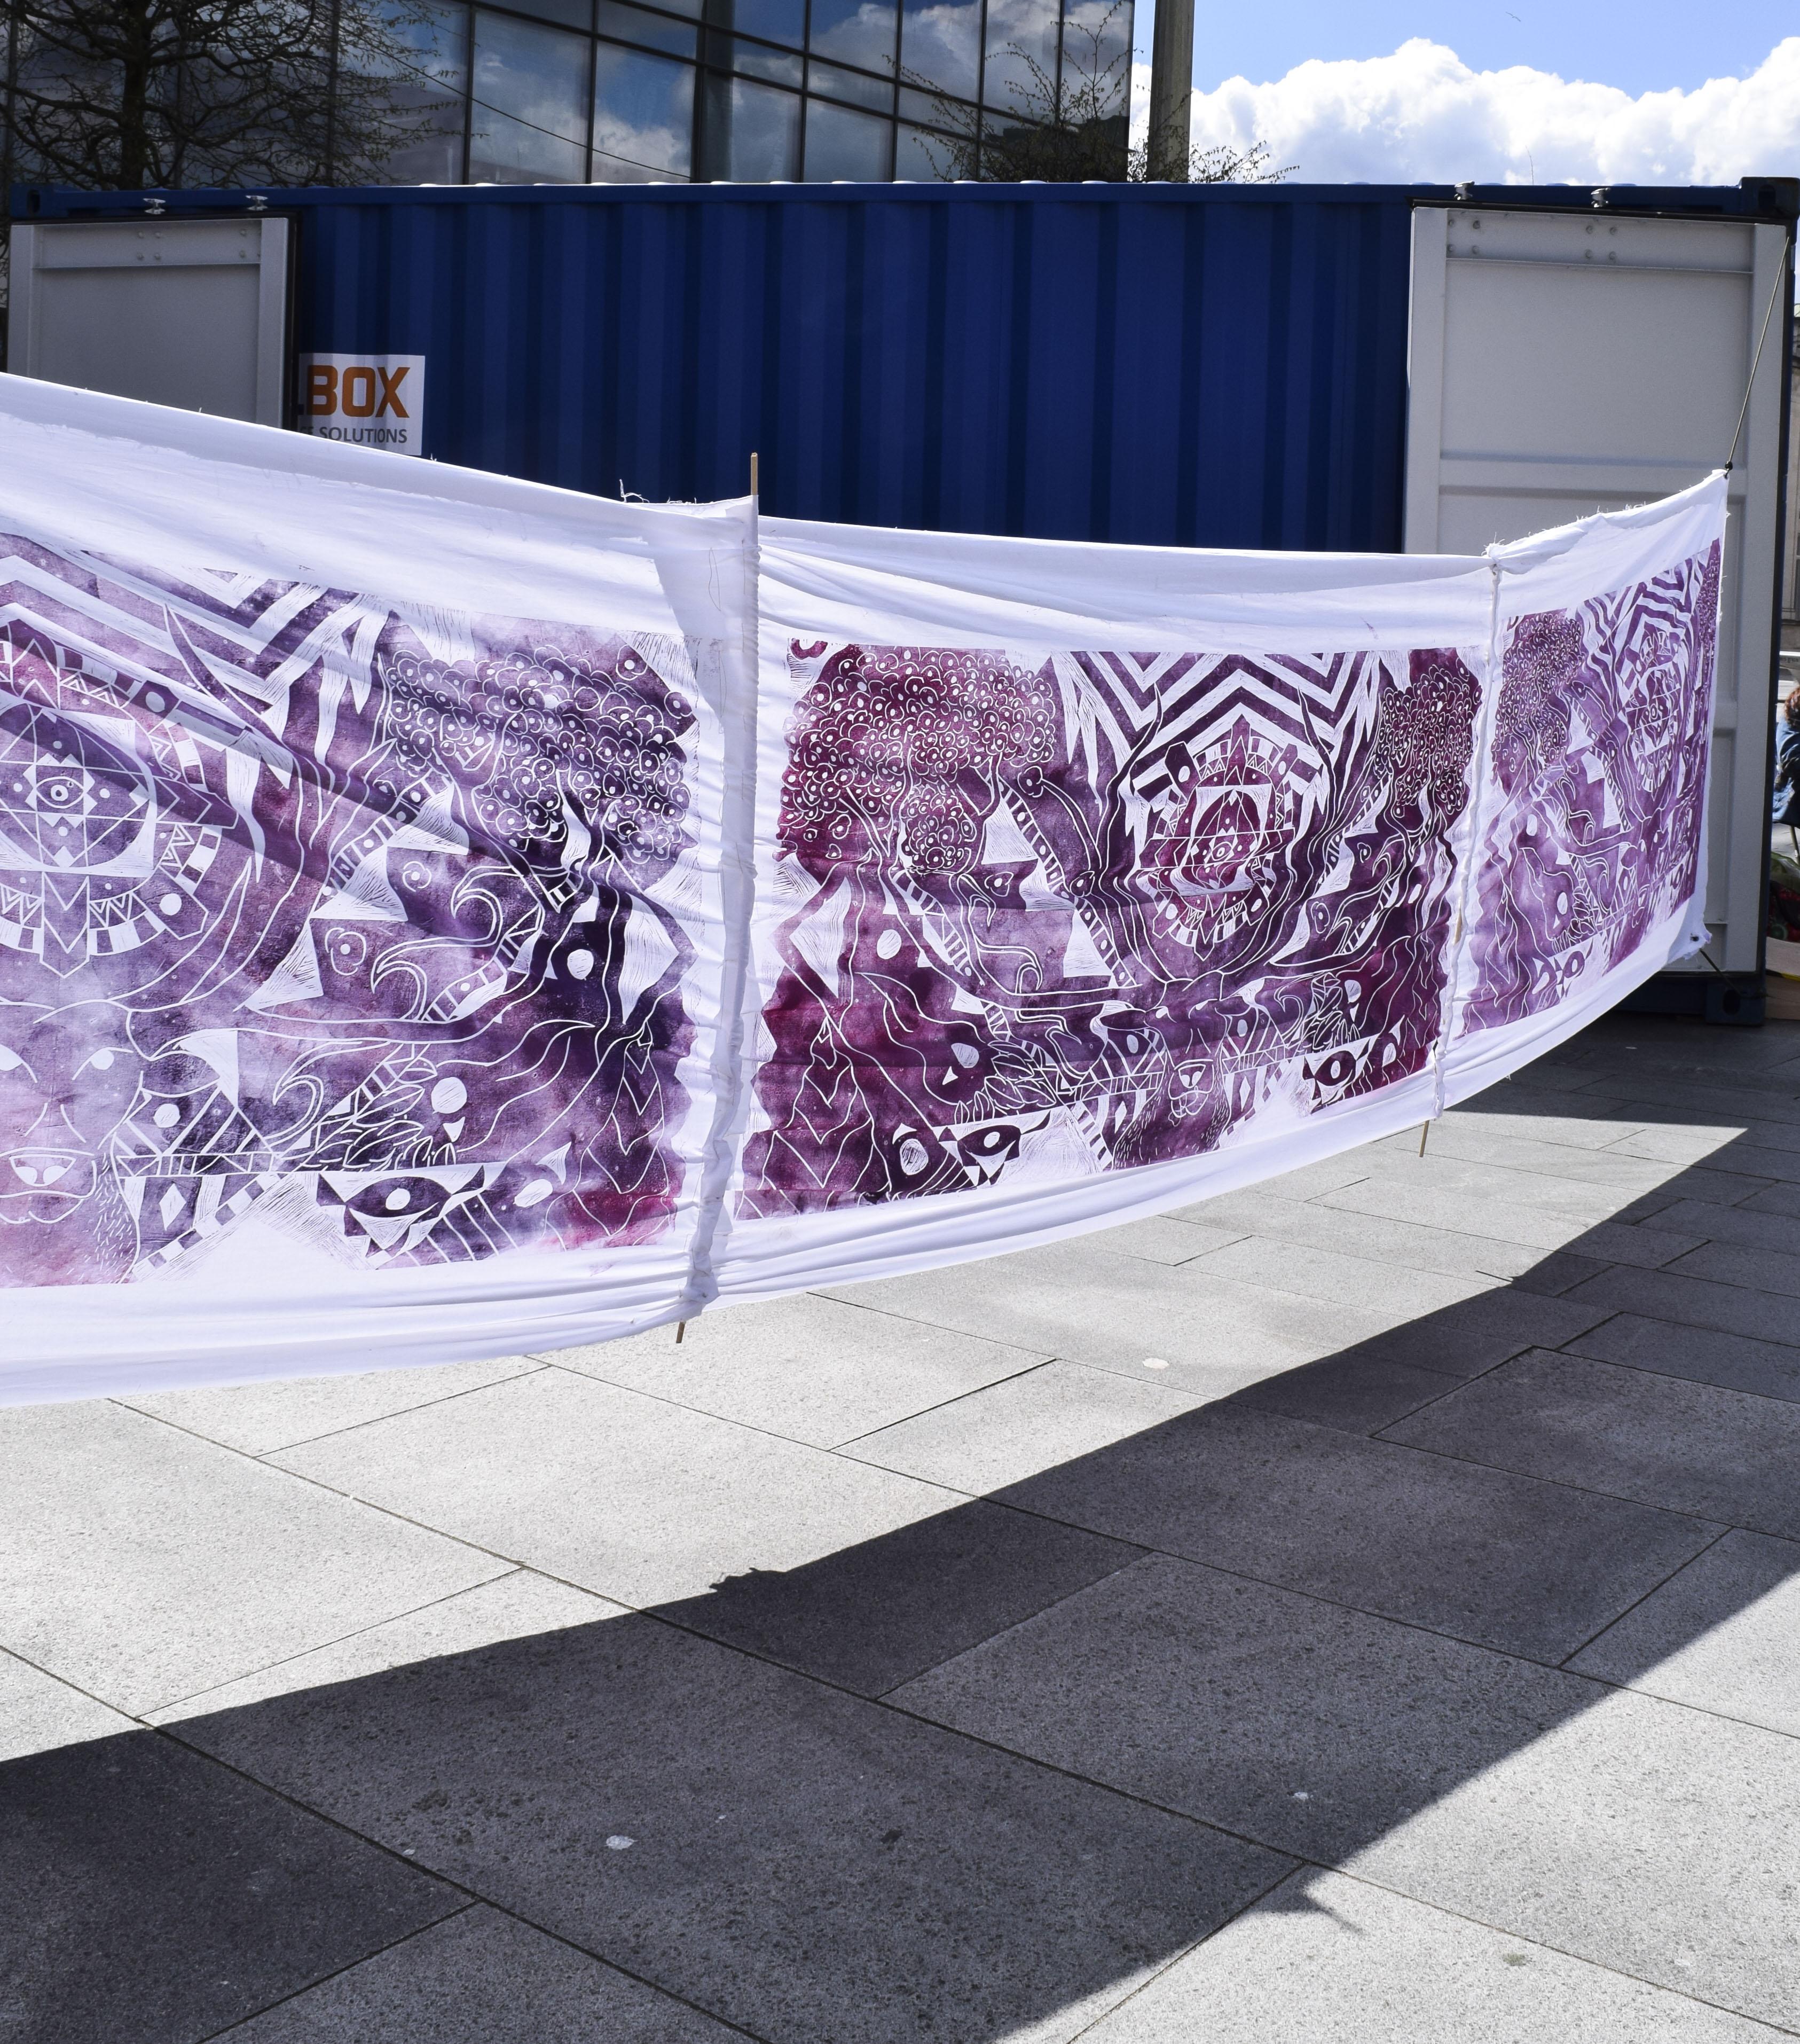 Art Exhibition brings 'Versatility' to Southampton